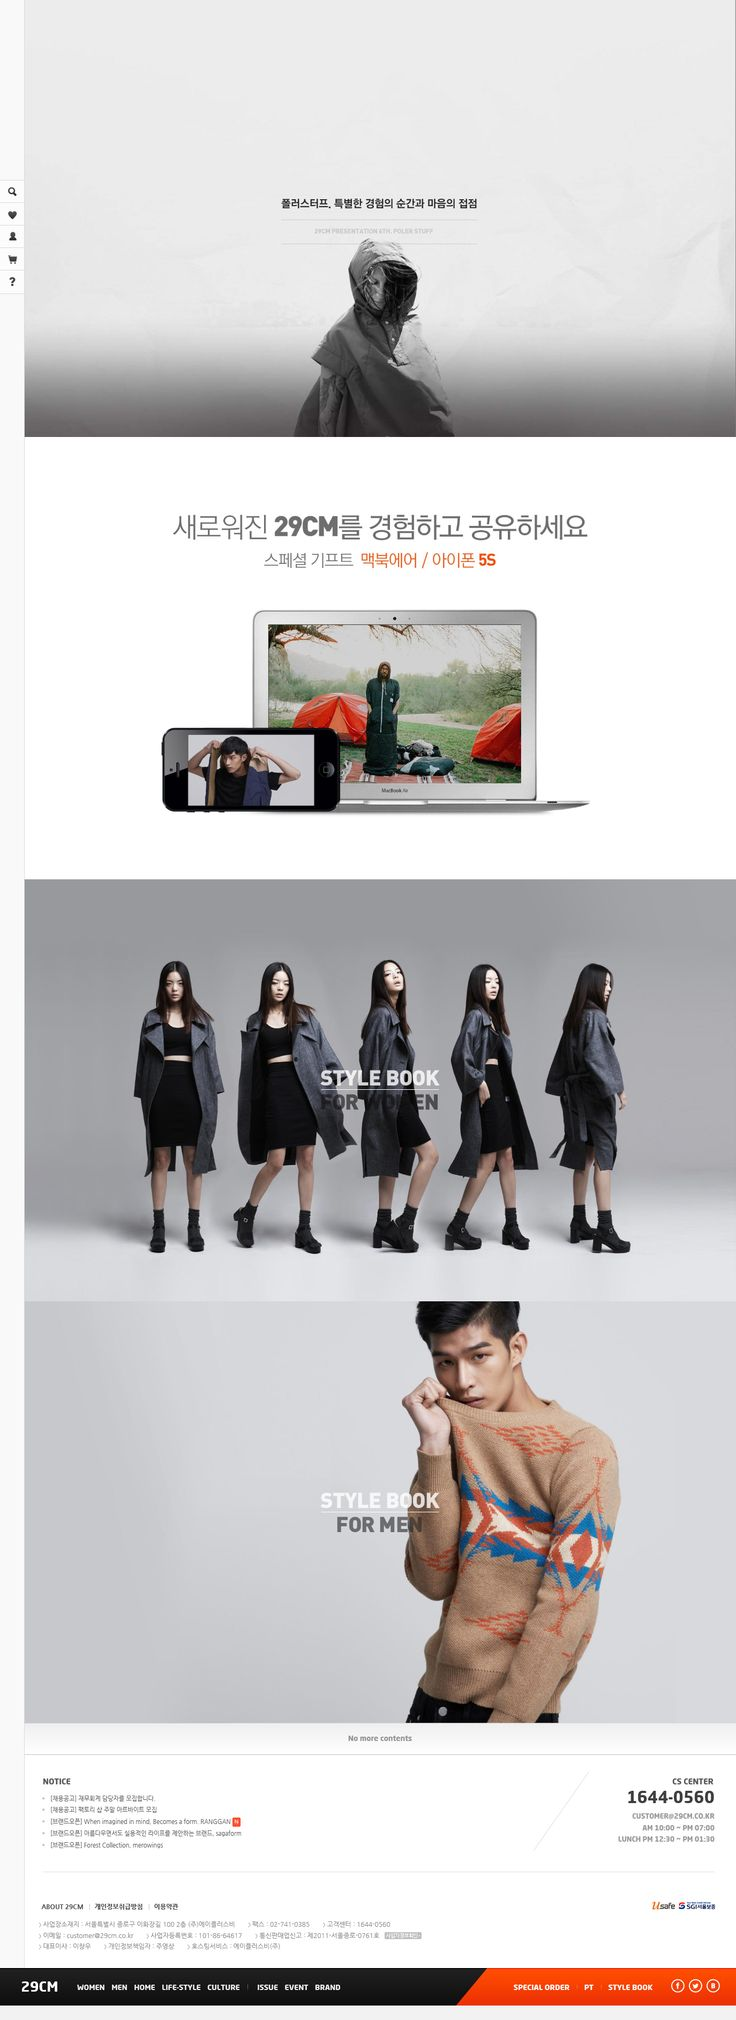 DCafeIn Website - 29cm